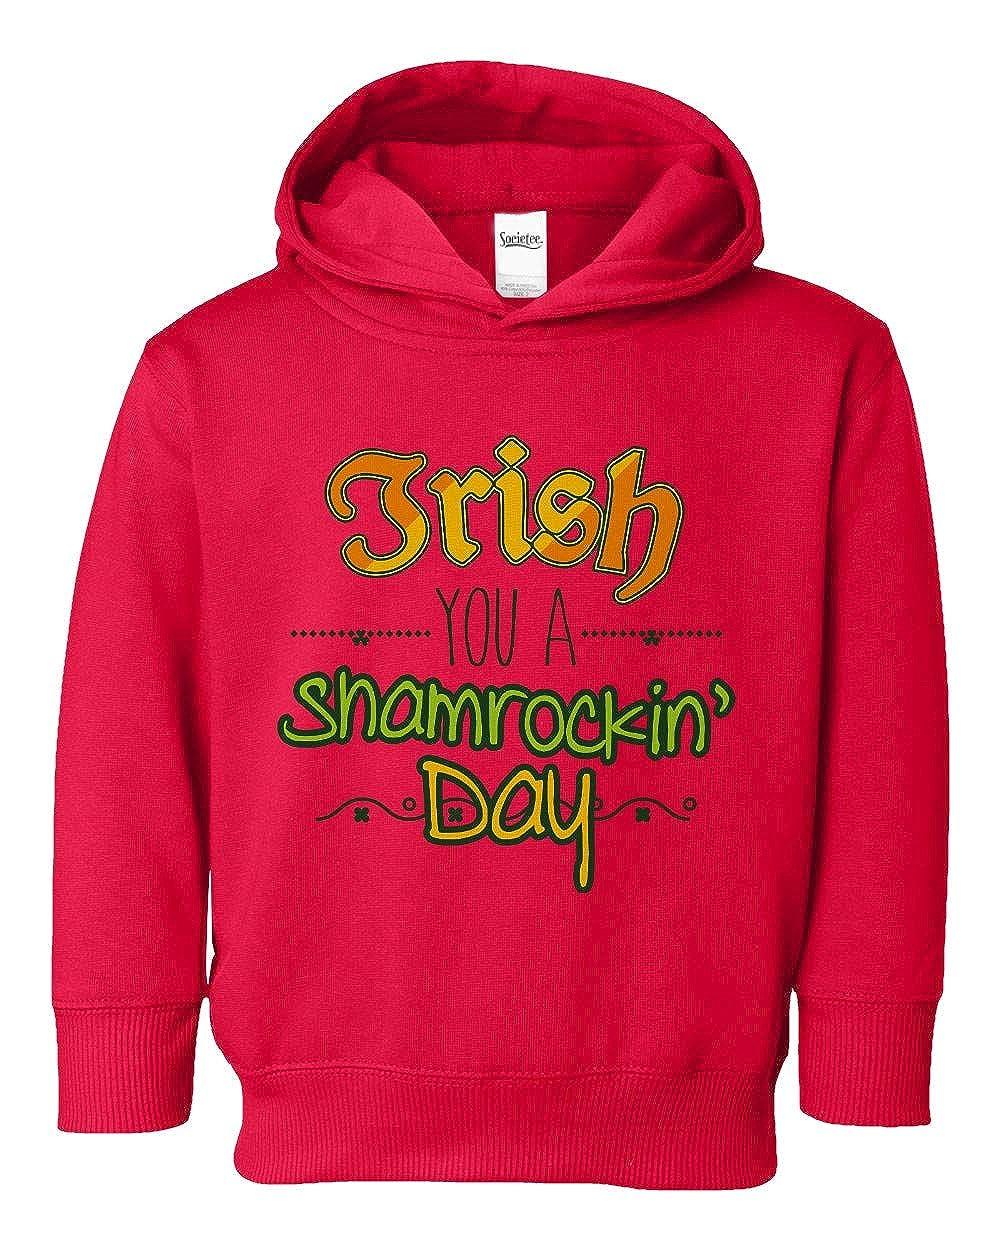 Societee Irish You A Shamrockin Day Girls Boys Toddler Hooded Sweatshirt